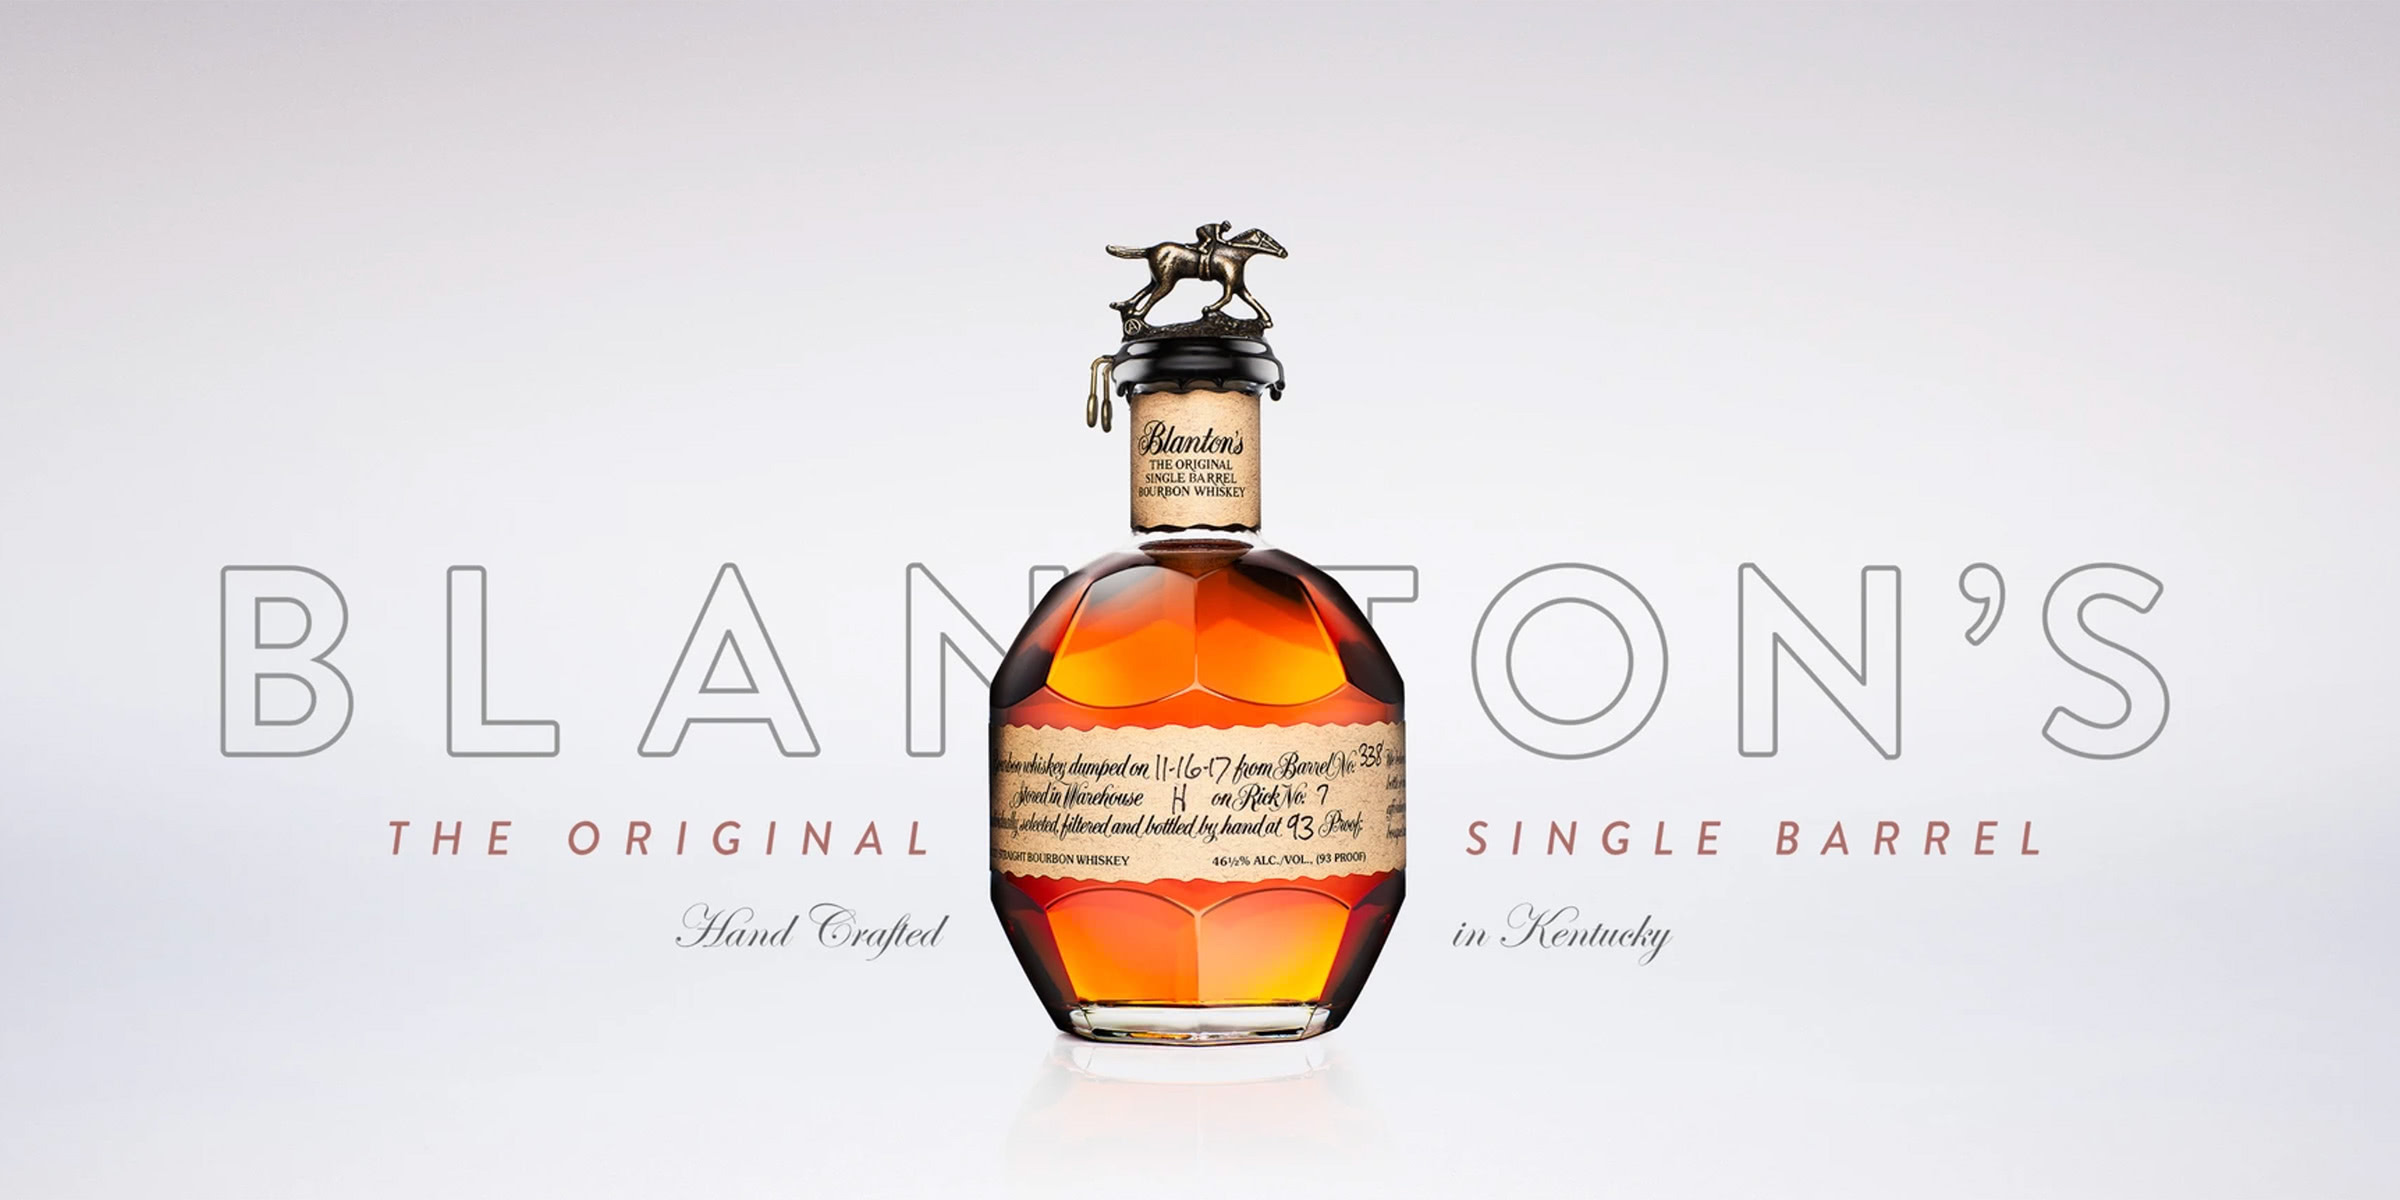 blanton's bourbon whiskey - Luxe Digital